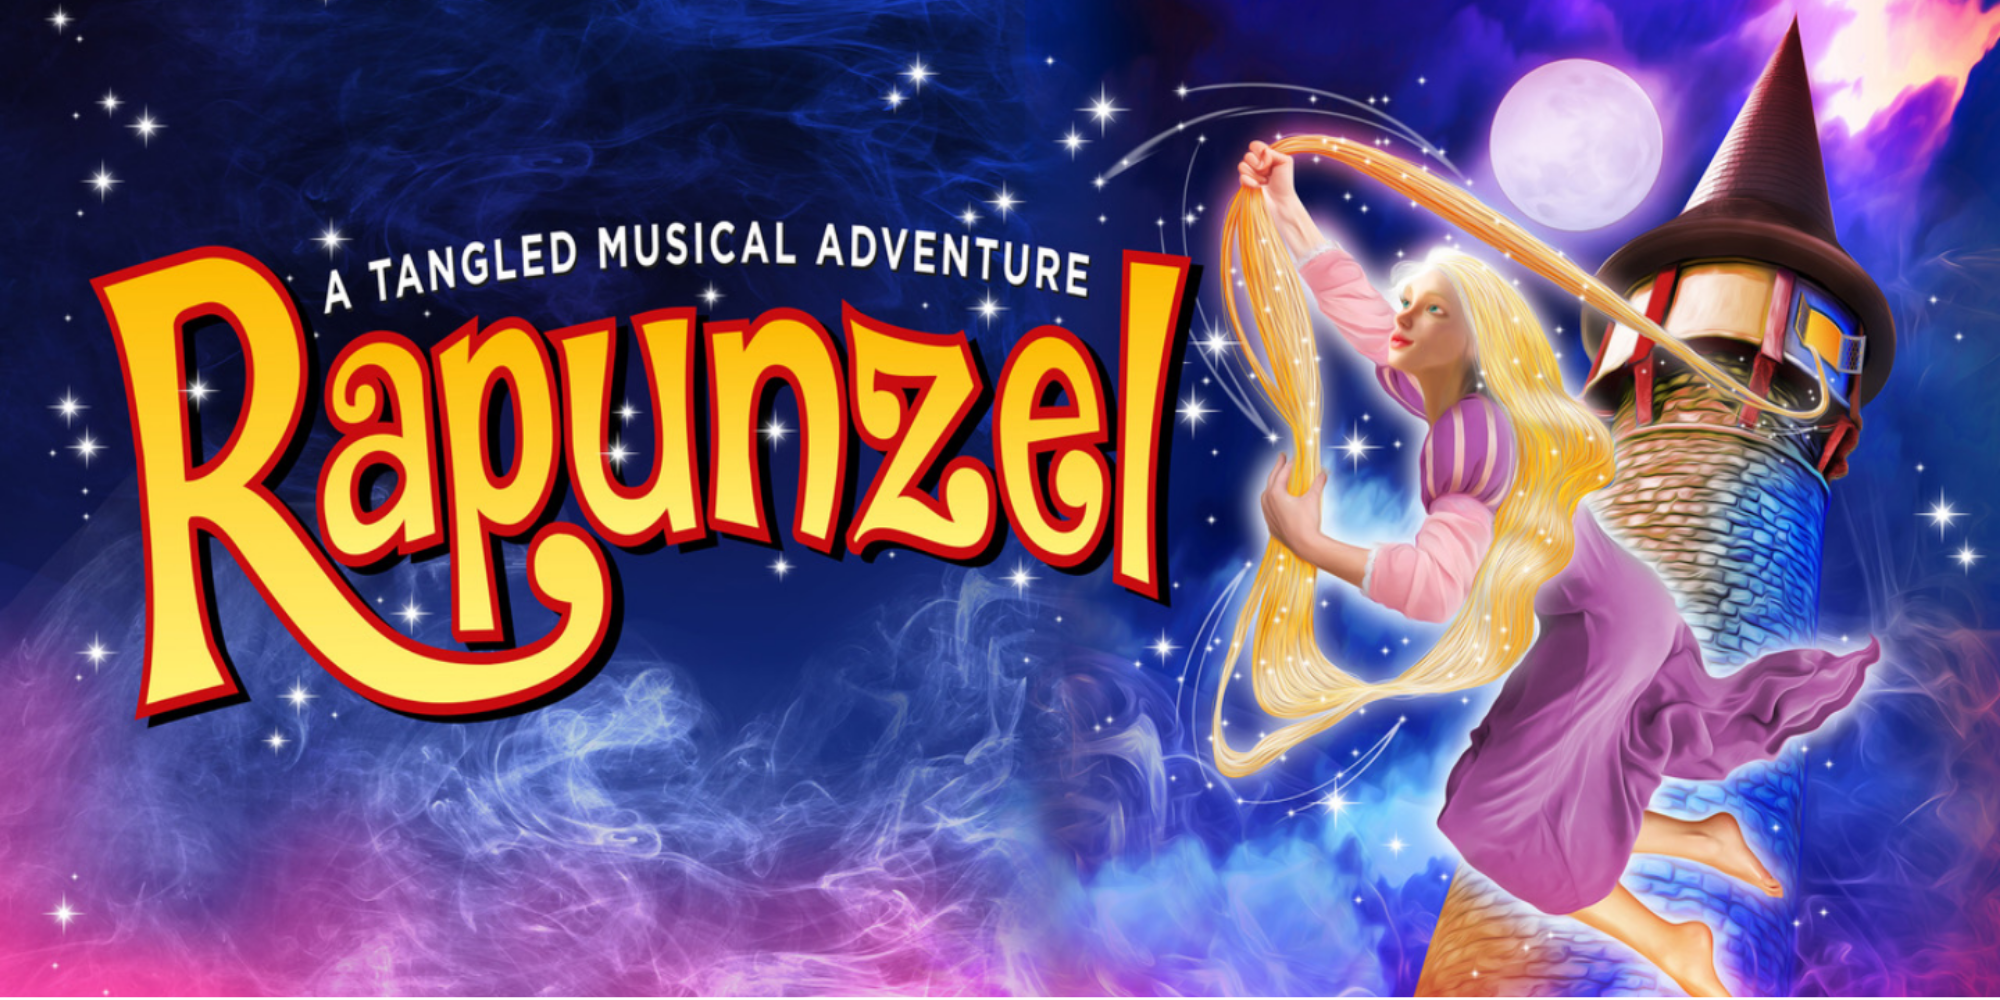 Rapunzel: A Tangled Musical Adventure!